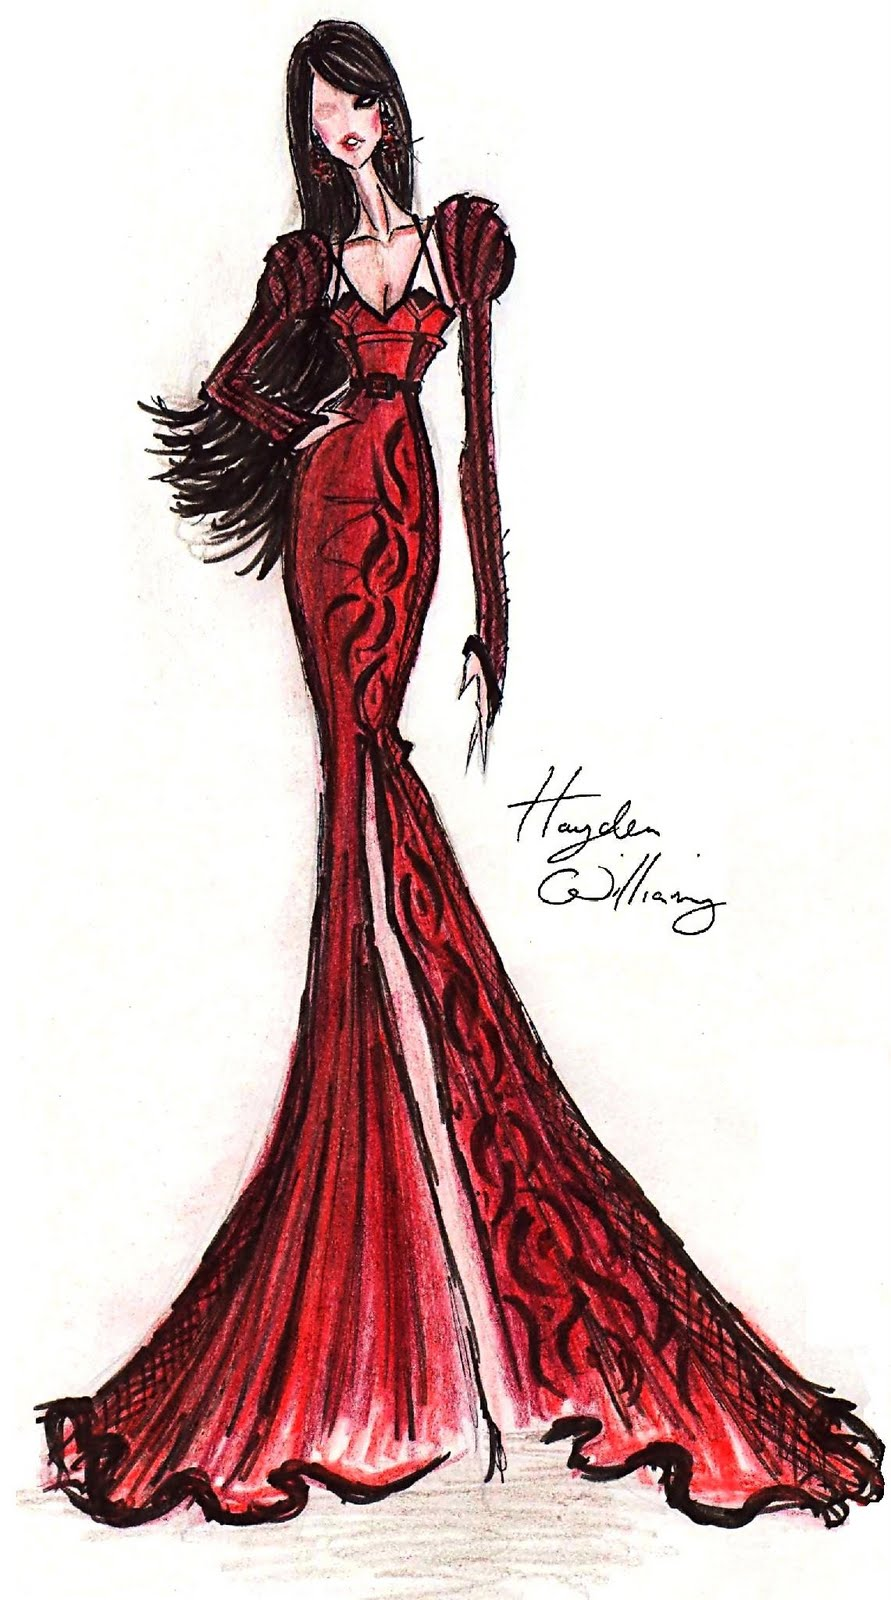 hayden williams fashion illustrations june 2011